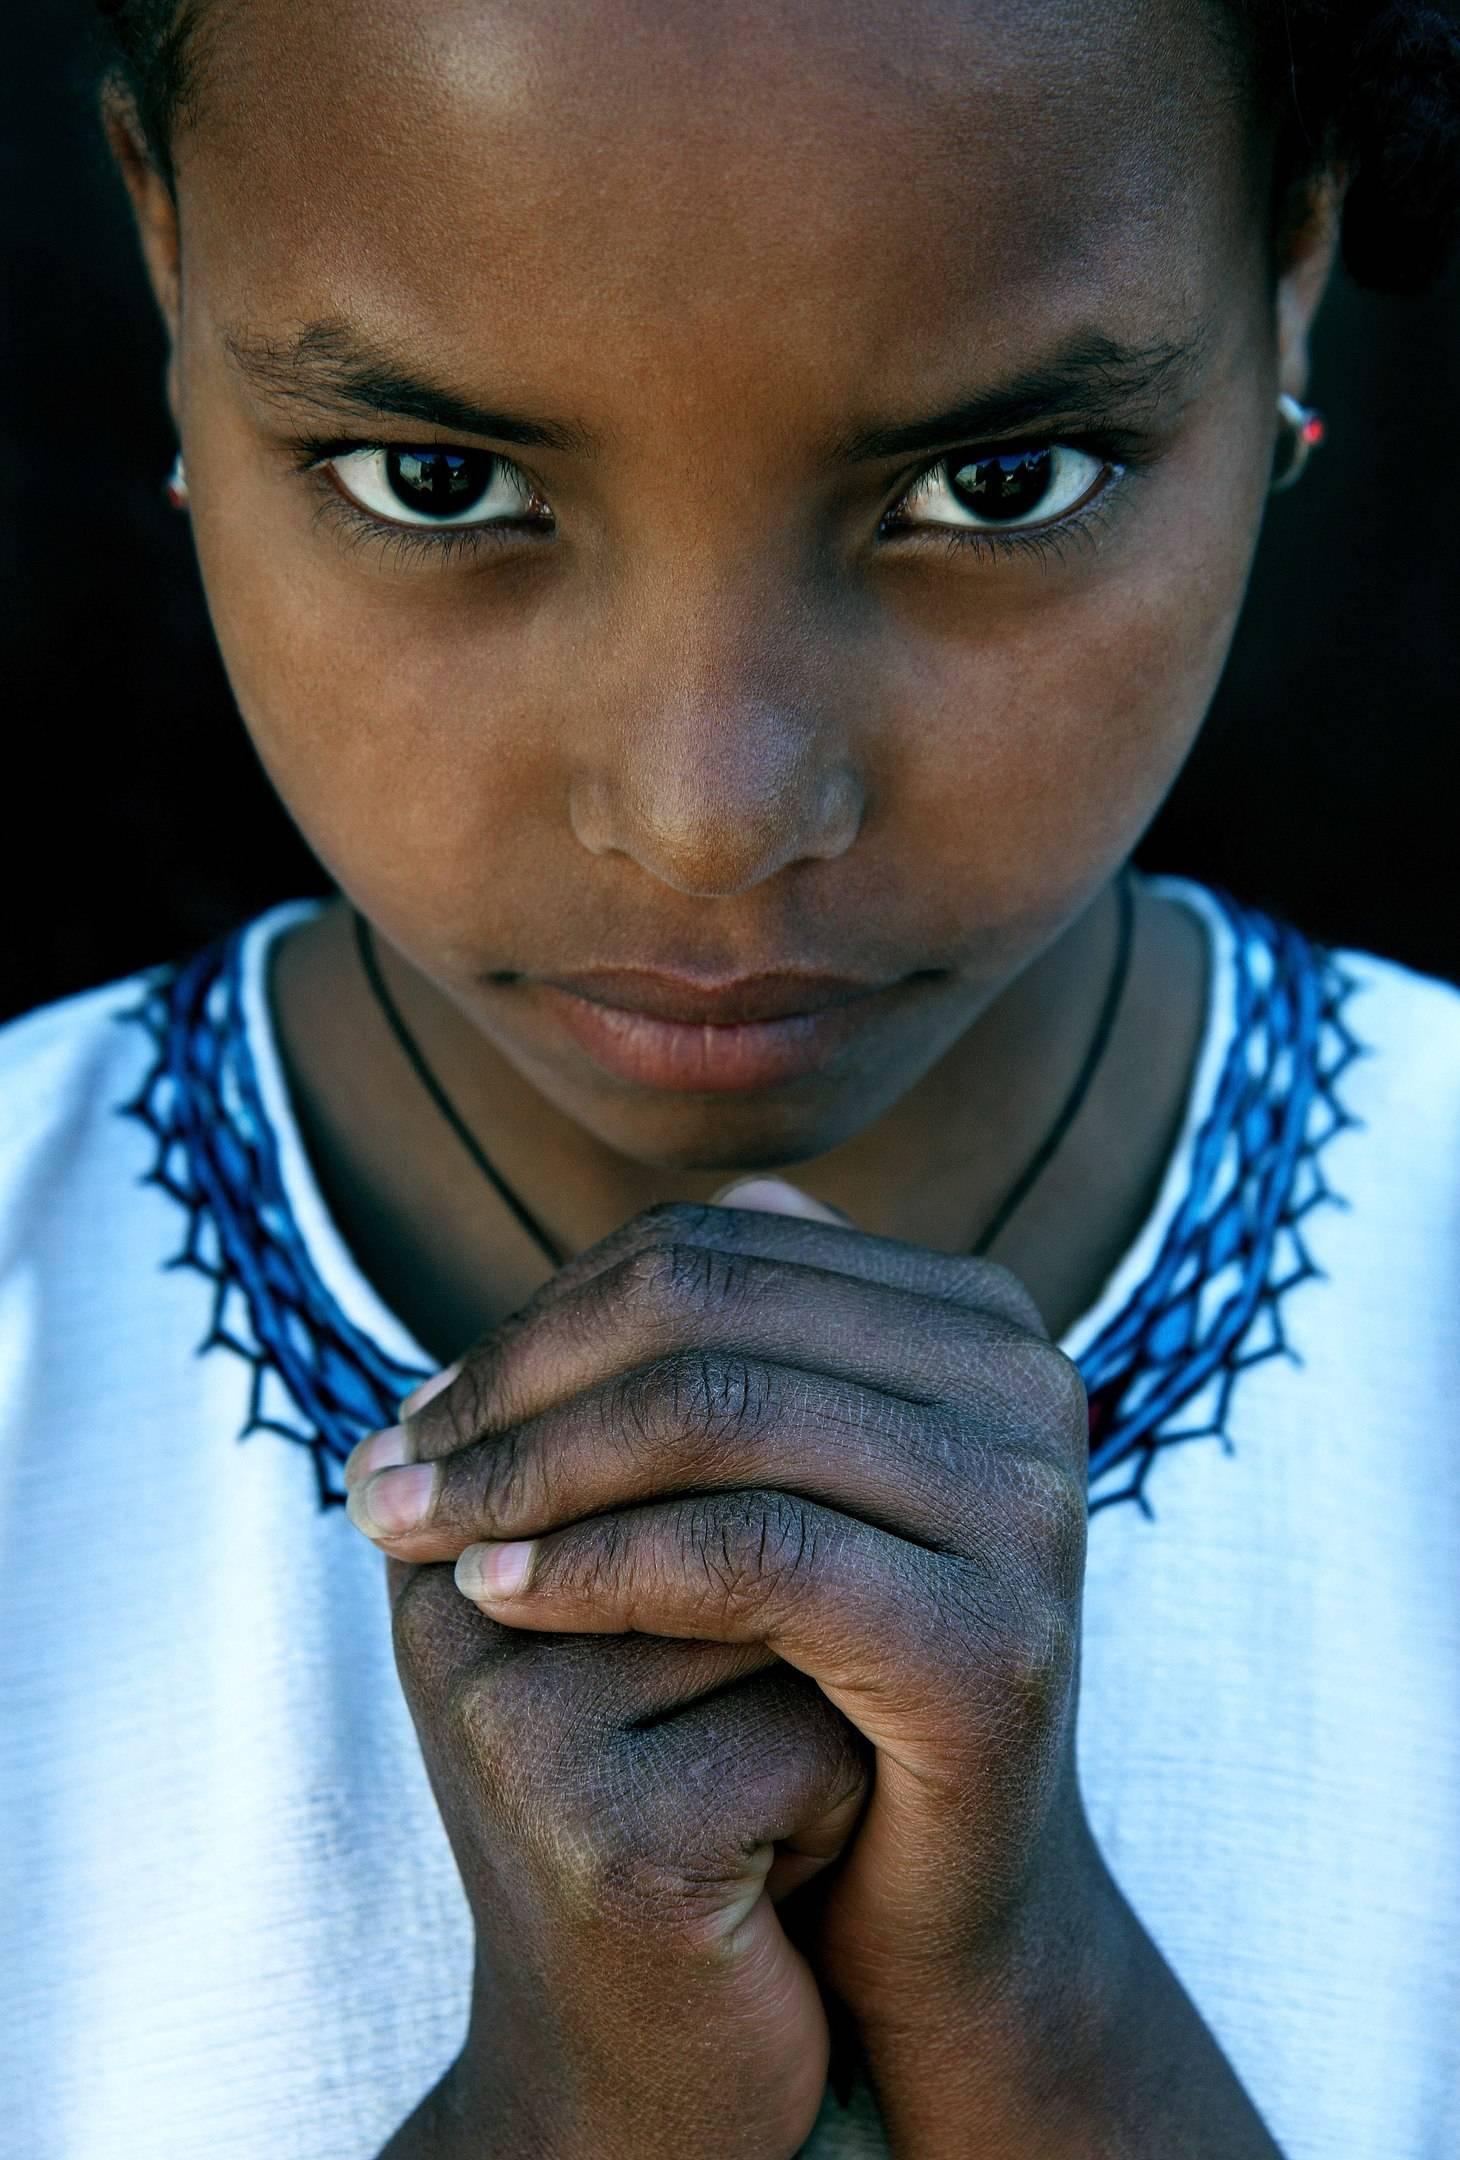 Девочка по имени Берекет (Аддис-Абеба. Эфиопия).